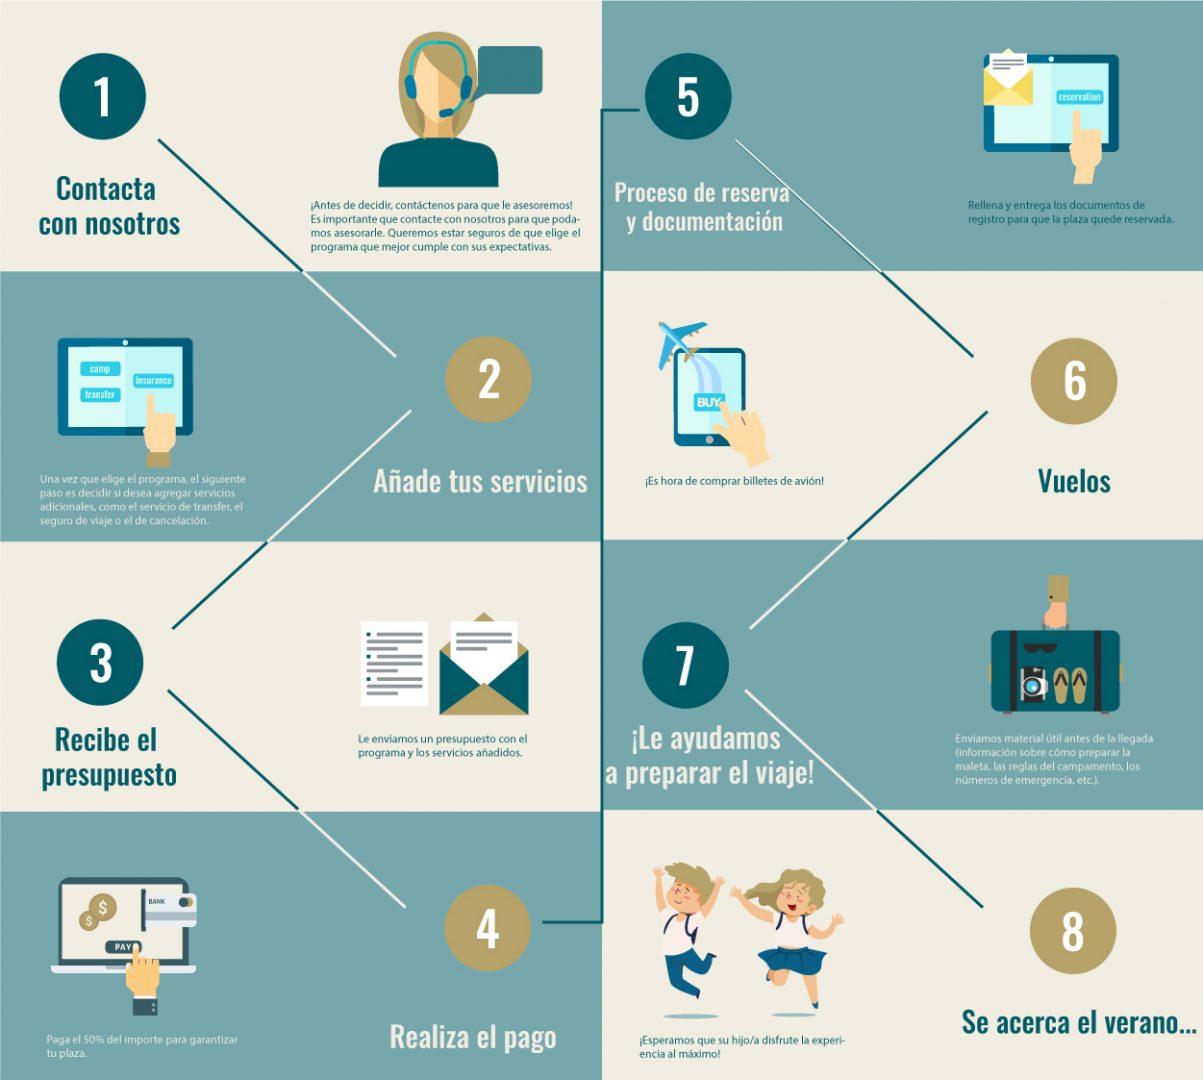 info spanish - Proceso de reserva Ertheo